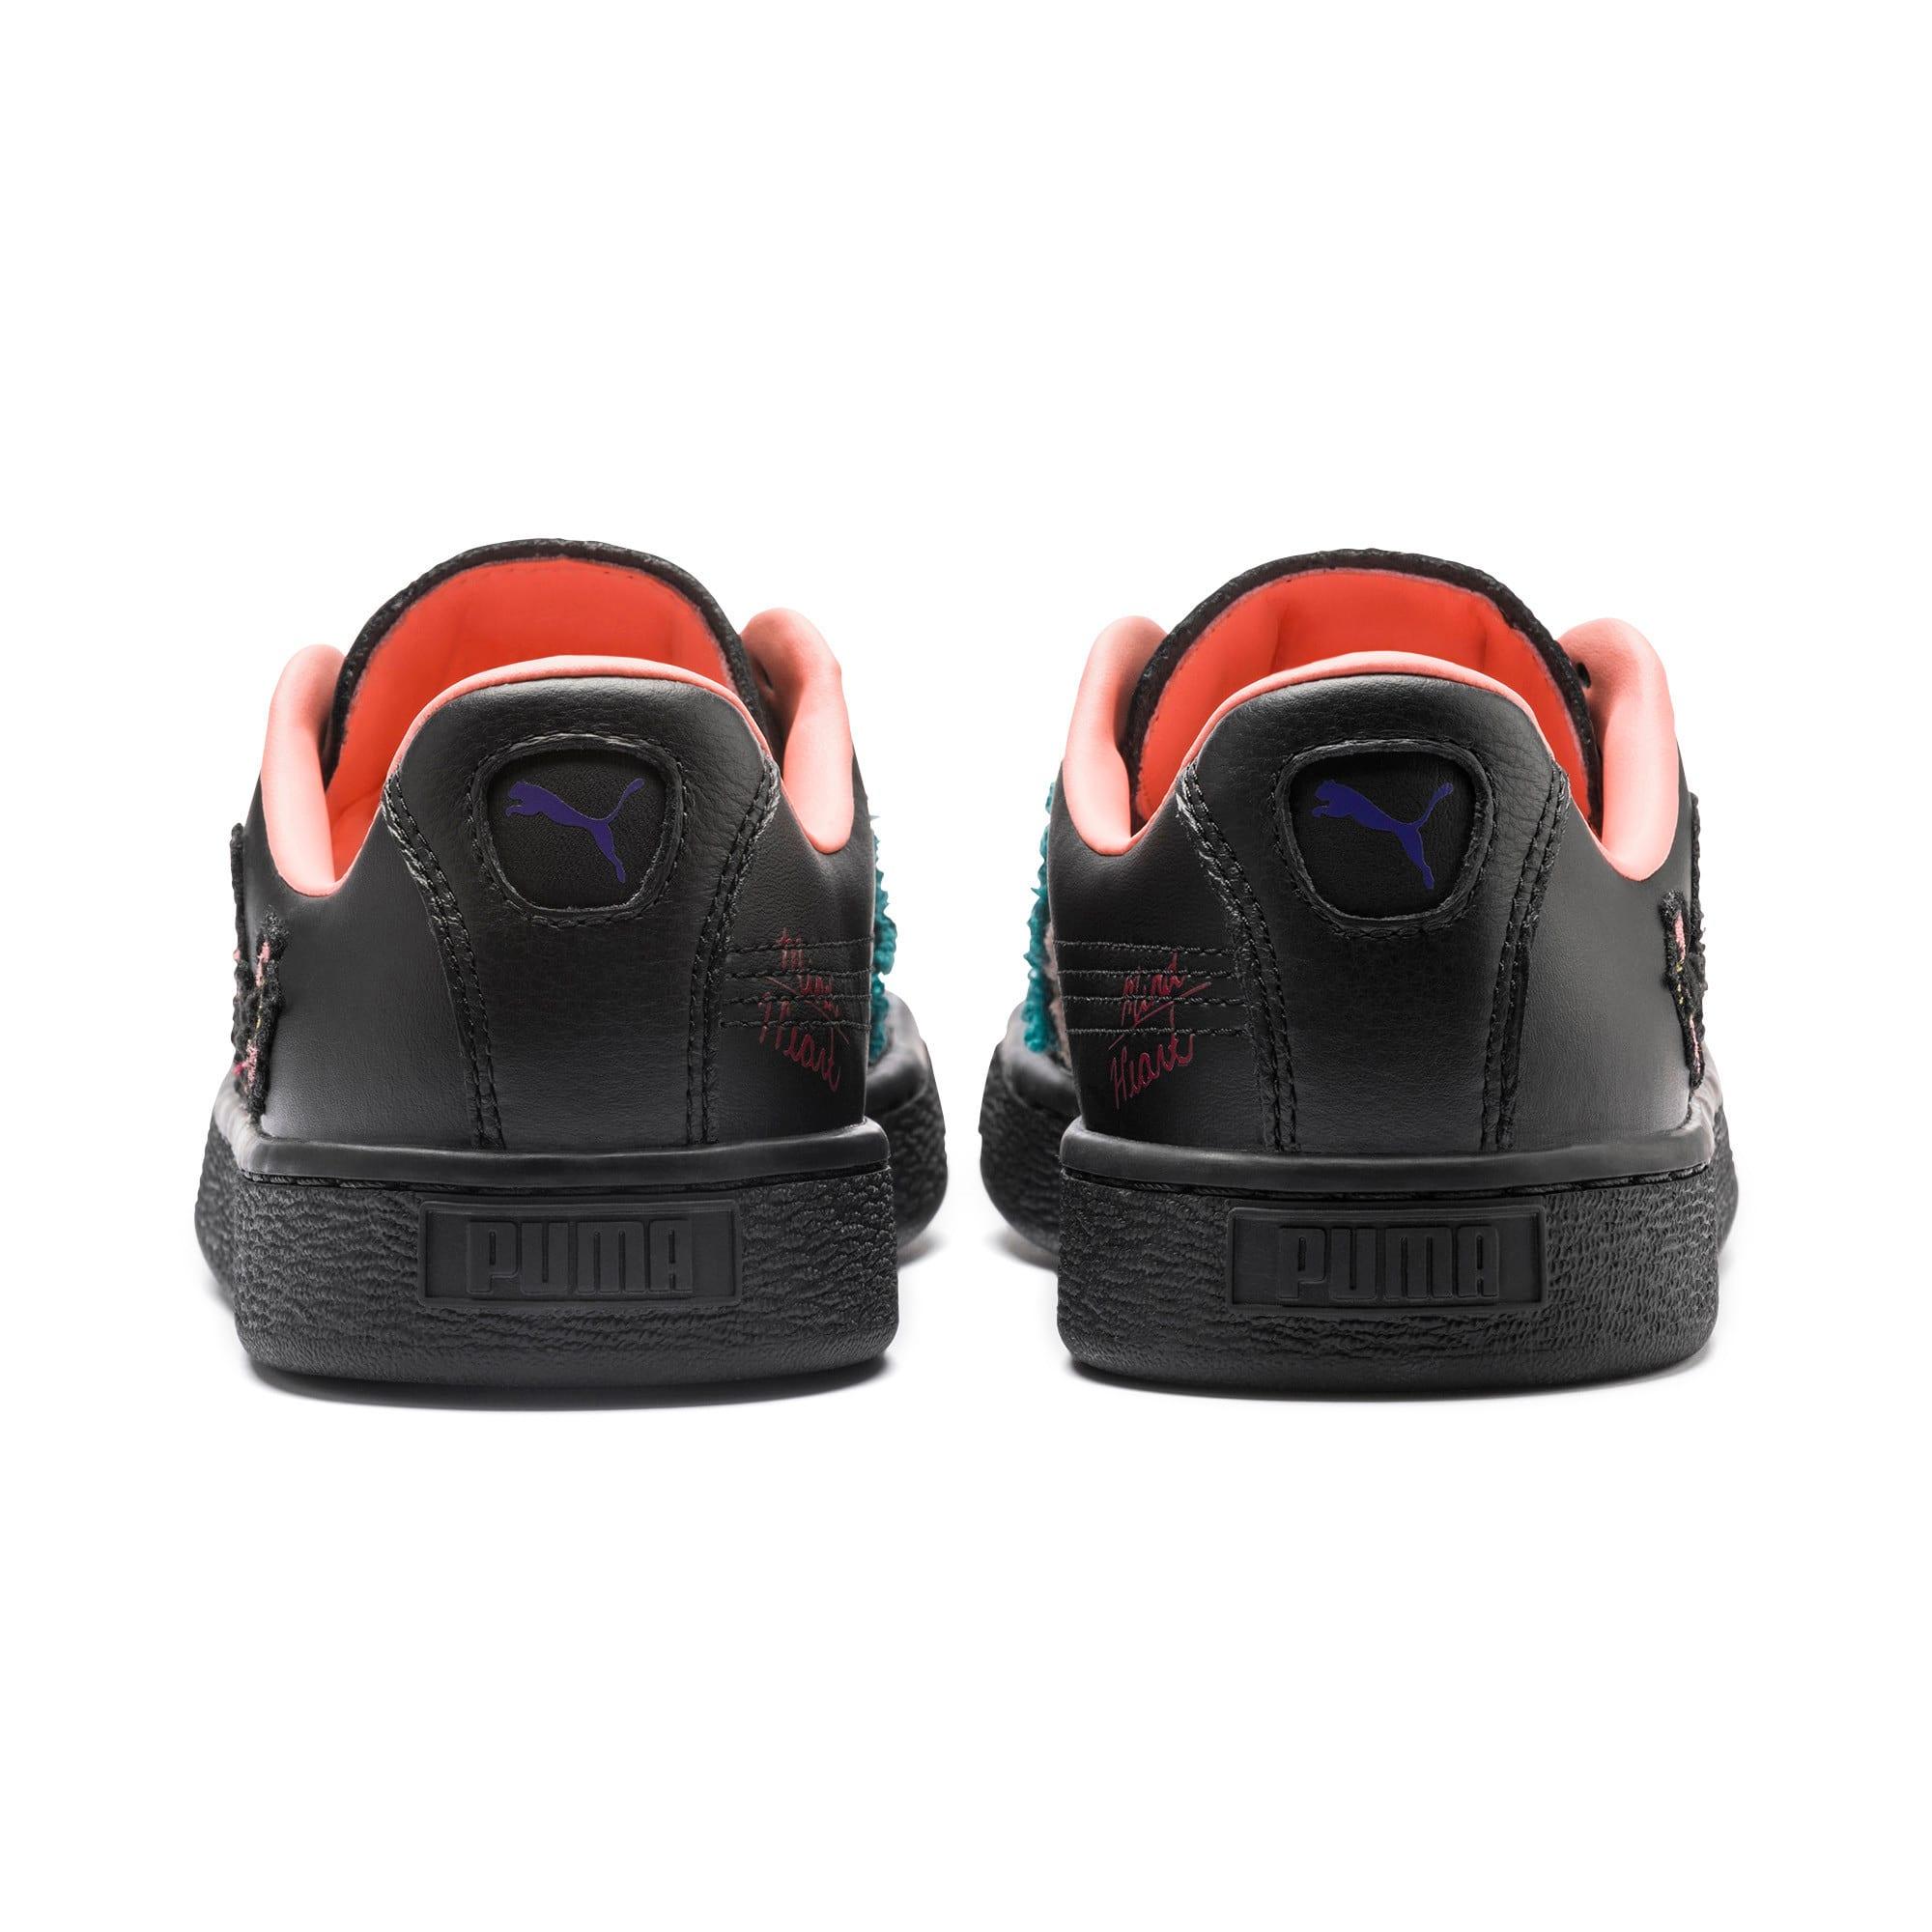 Thumbnail 3 of PUMA x SUE TSAI Basket Women's Sneakers, Puma Black, medium